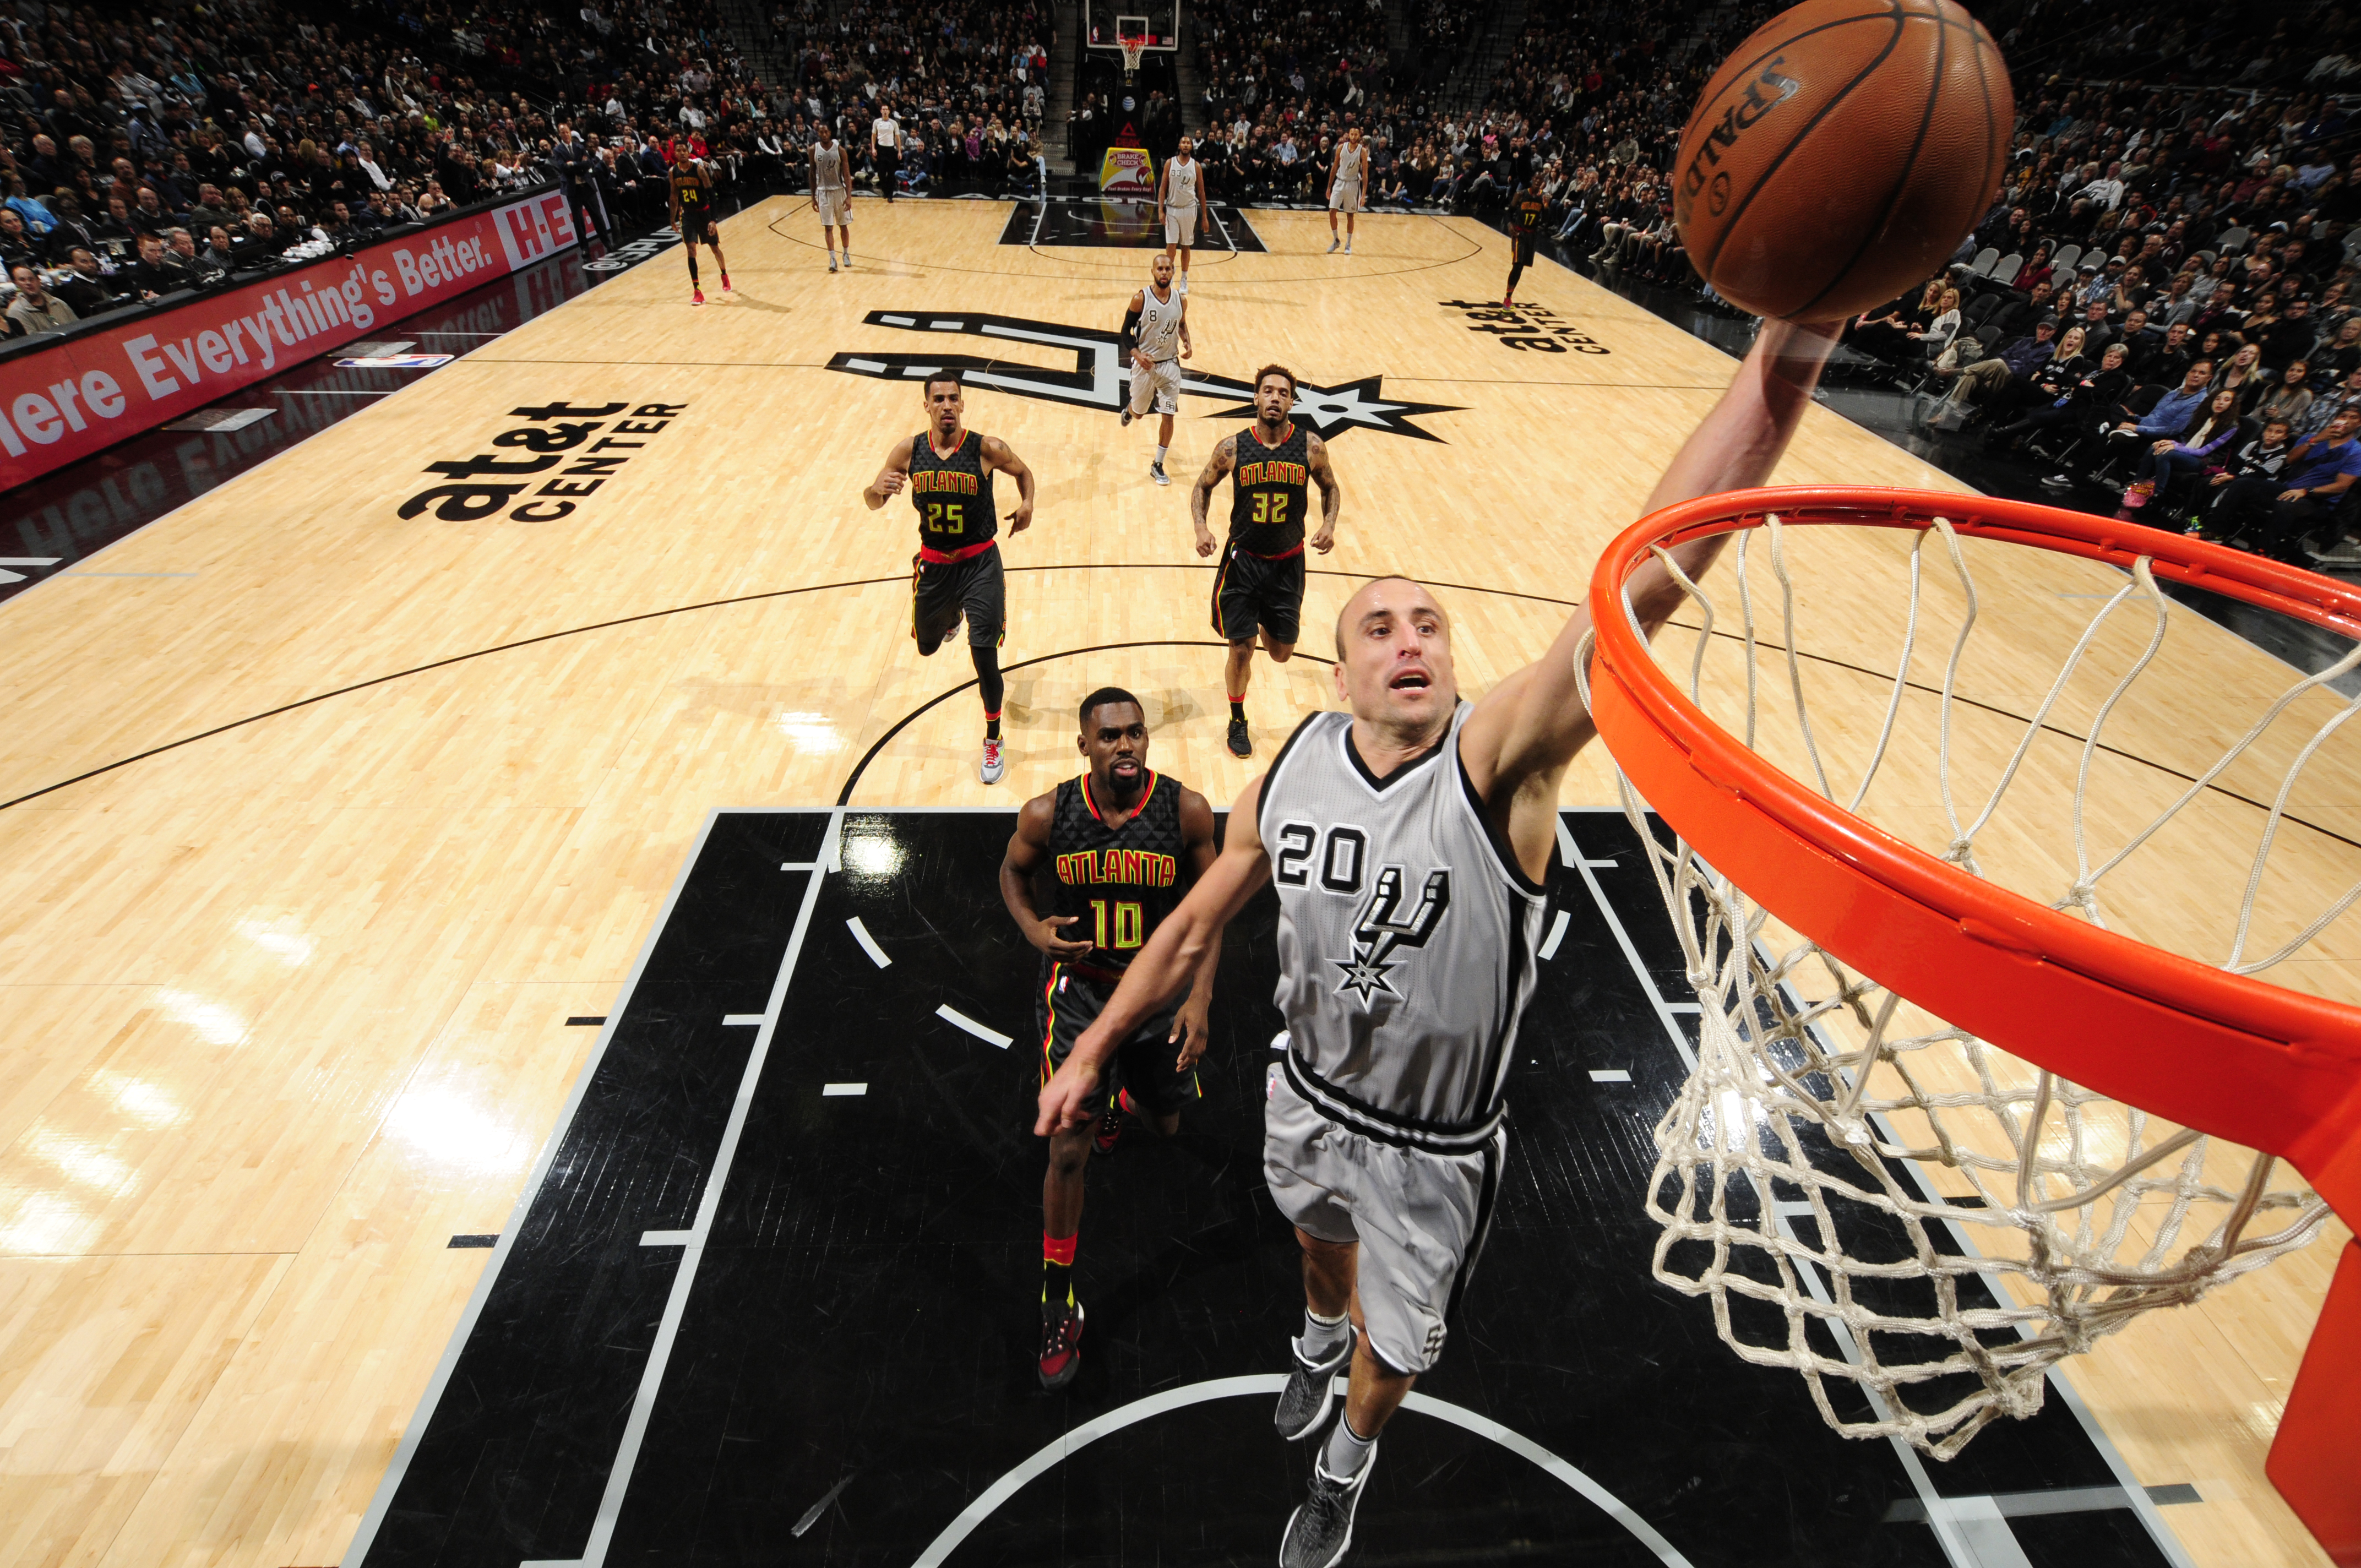 SAN ANTONIO, TX - NOVEMBER 28:  Manu Ginobili #20 of the San Antonio Spurs goes to the basket against the Atlanta Hawks on November 28, 2015 at the AT&T Center in San Antonio, Texas.